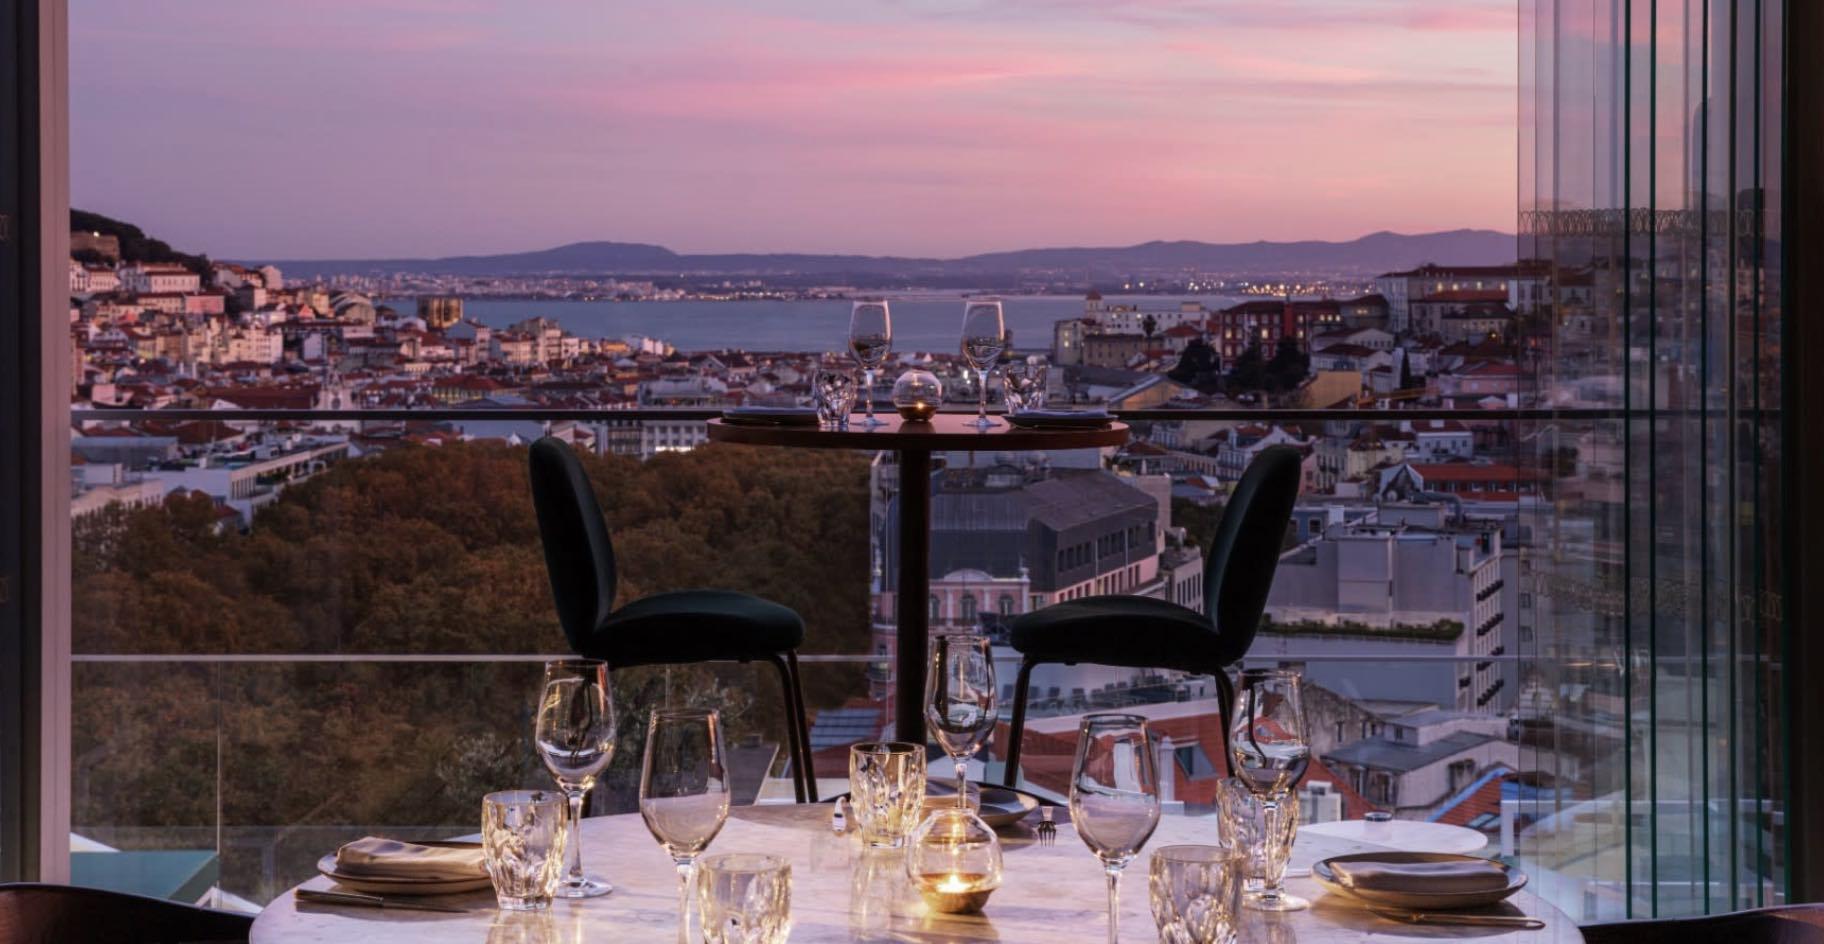 Tivoli Avenida Liberdade Lisboa view of private dining